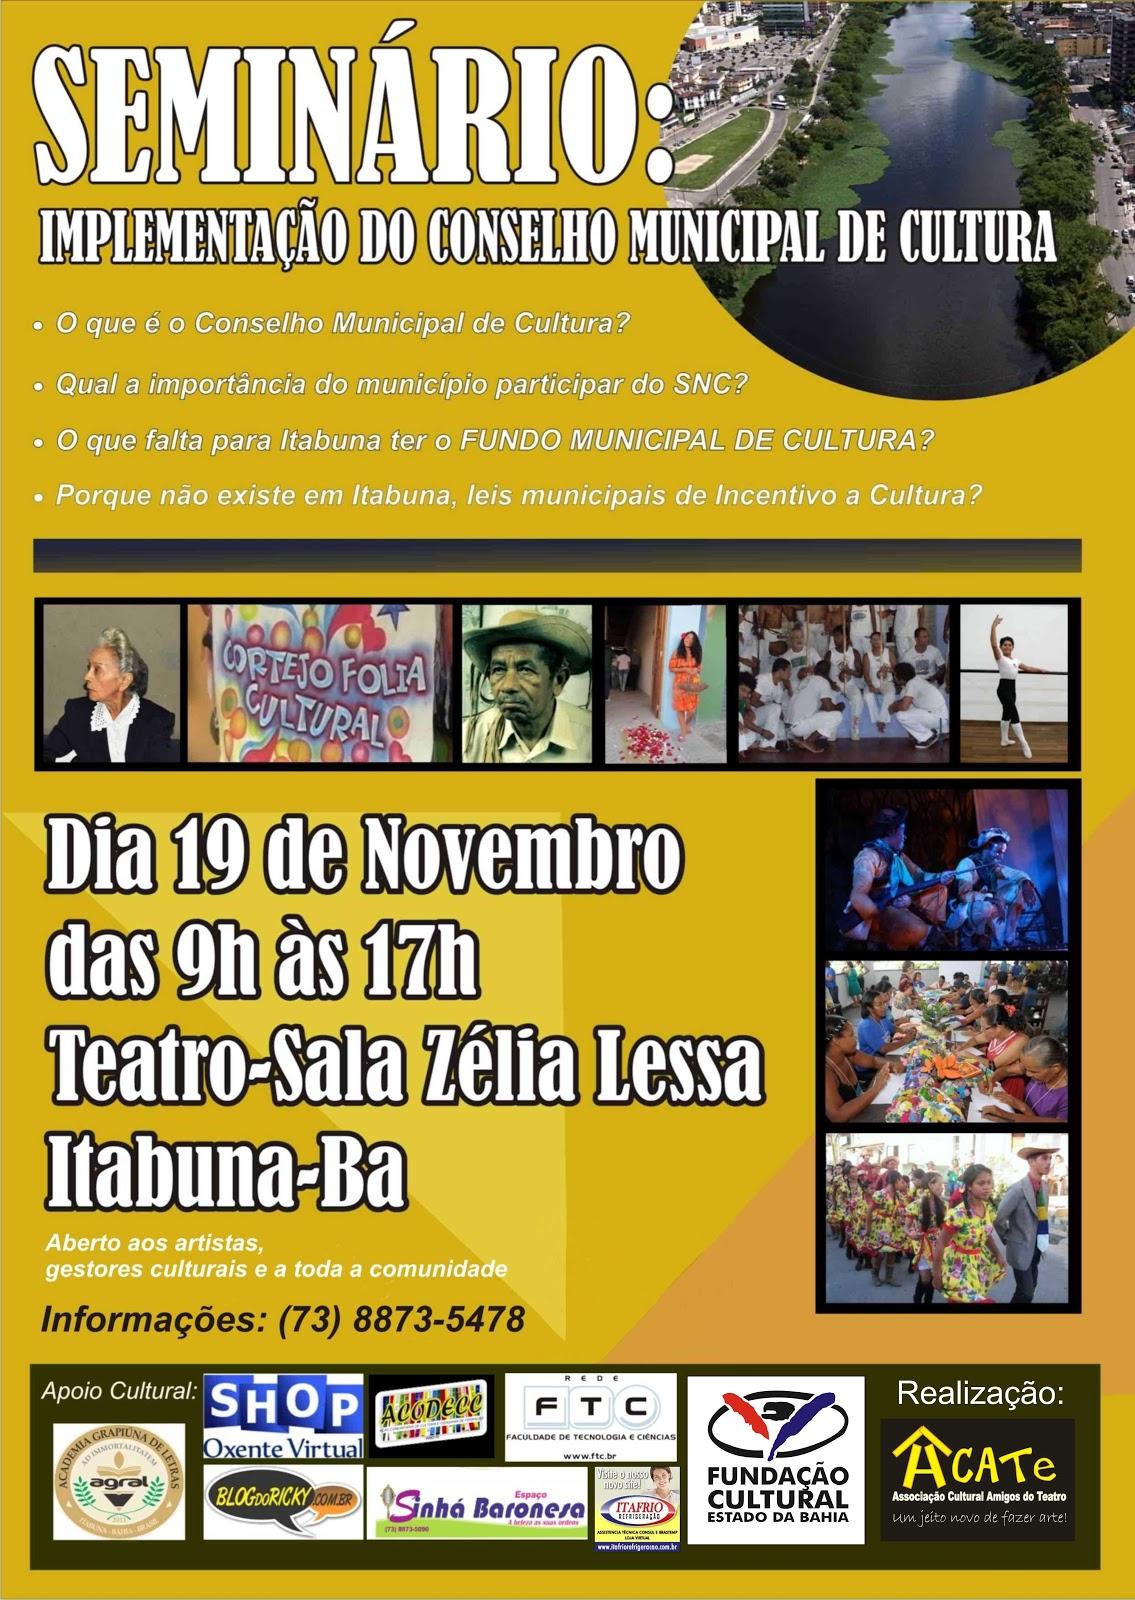 http://2.bp.blogspot.com/-zkx5clKxhYM/UJ-qRXsyt1I/AAAAAAAAI4A/CC01Uo34CH8/s1600/Cartaz+do+Semin%C3%A1rio+de+Implementa%C3%A7%C3%A3o+do+Conselho+Municipal+de+Cultura+de+Itabuna.jpg